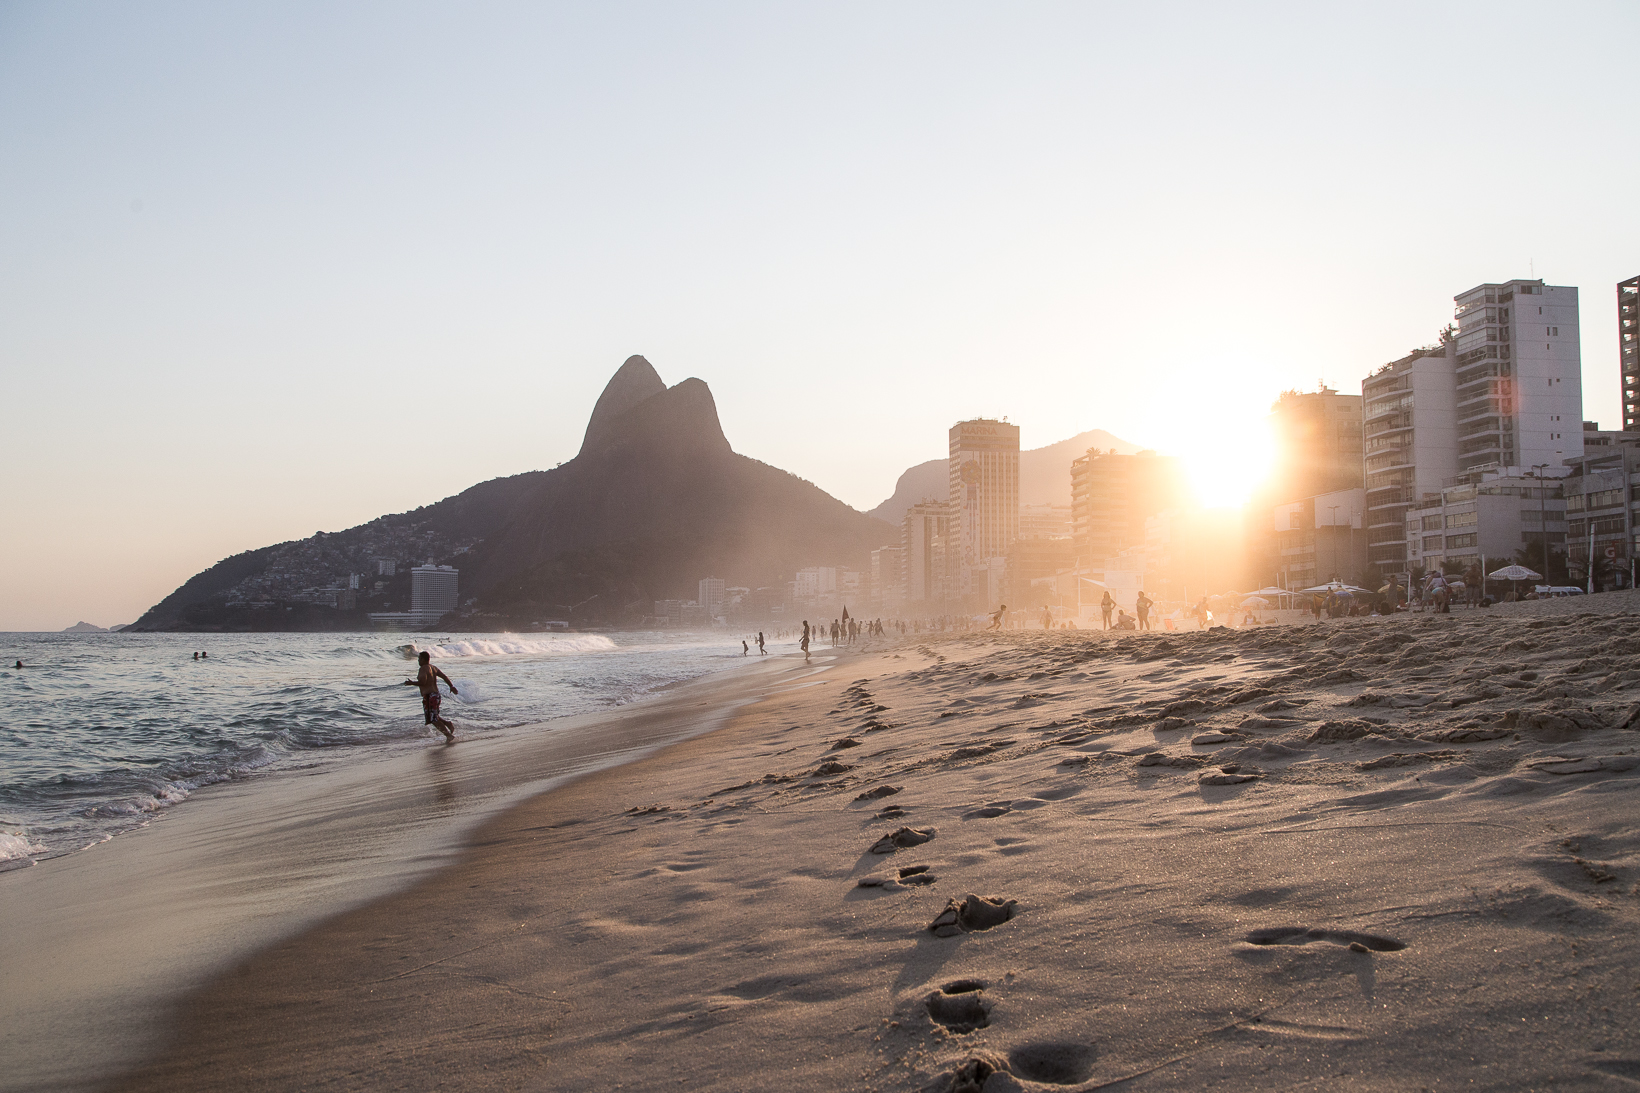 Road Trips: A Mesmerizing Olympic Tour Through Rio de Janeiro, Brazil